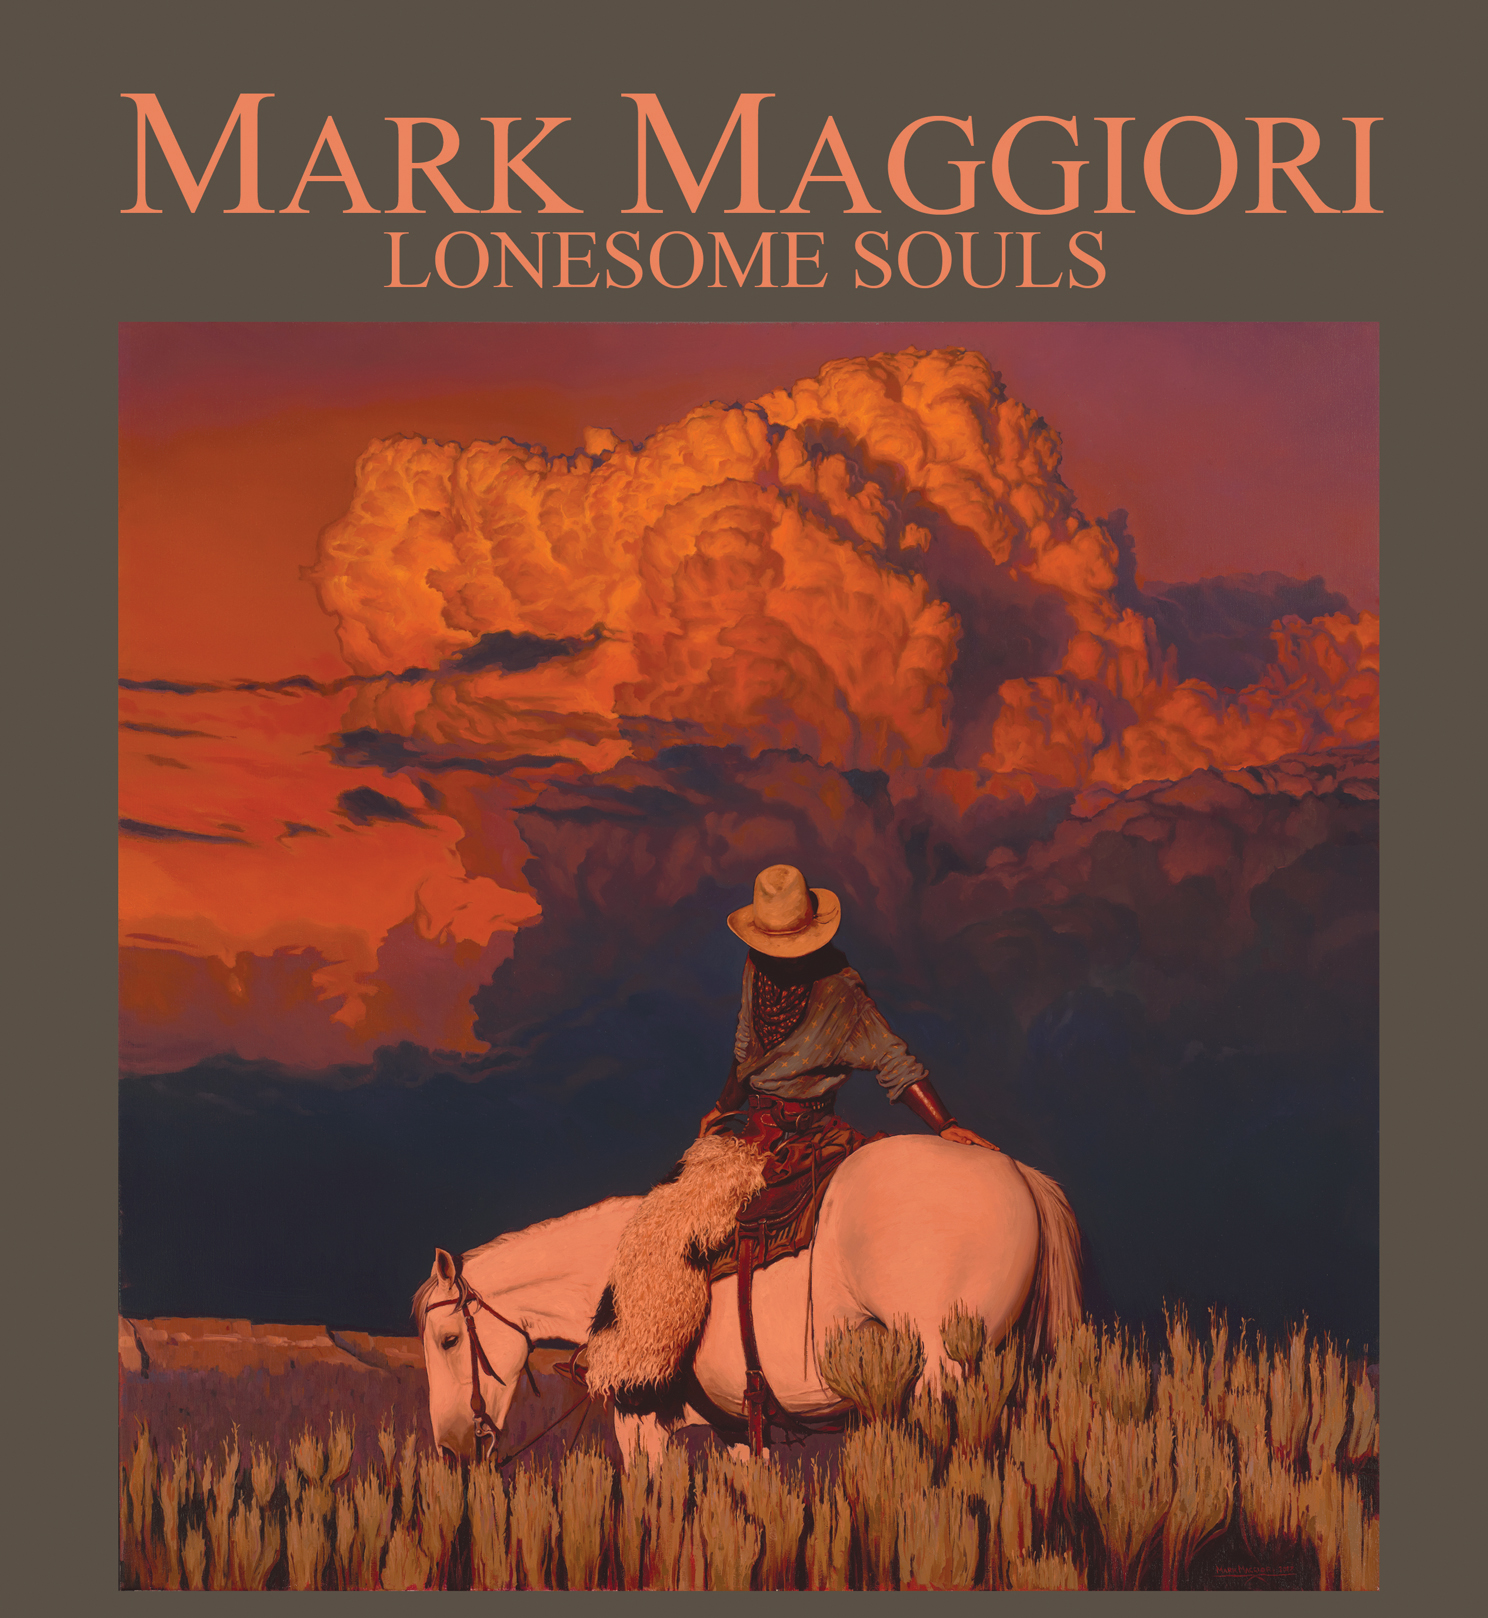 Mark Maggiori Posters Available in-store.